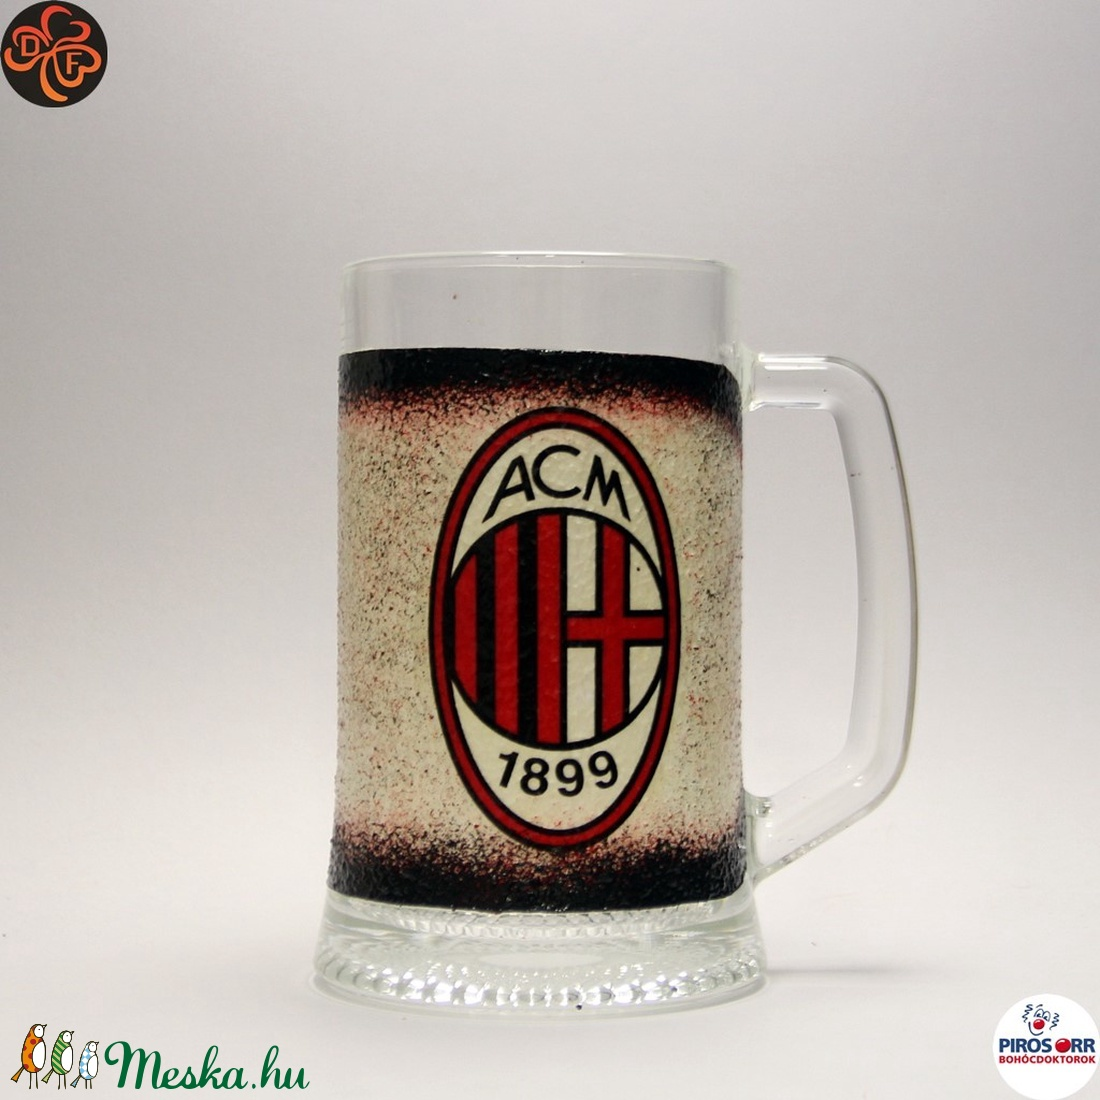 AC MILAN sörös pohár ; foci szurkolóknak (decorfantasy) - Meska.hu